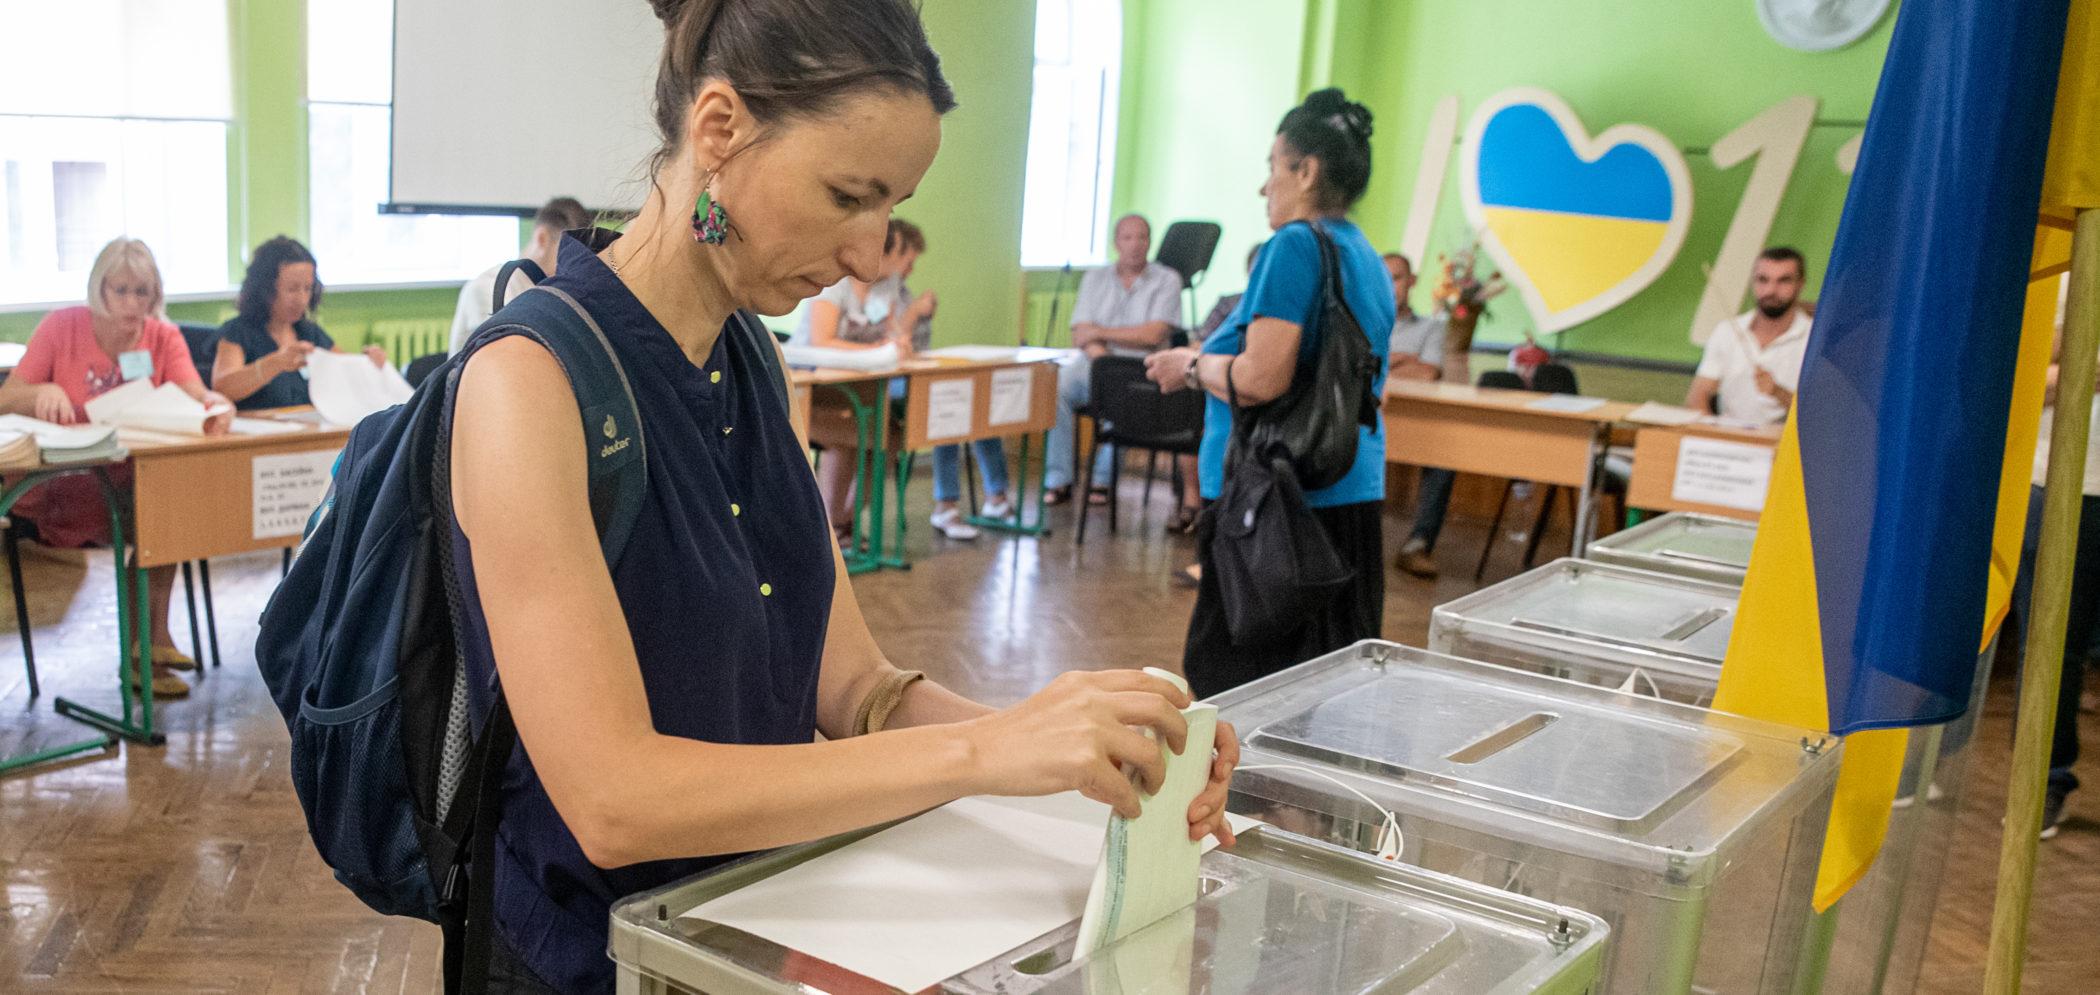 Ukraine's parliament adopts historic election code